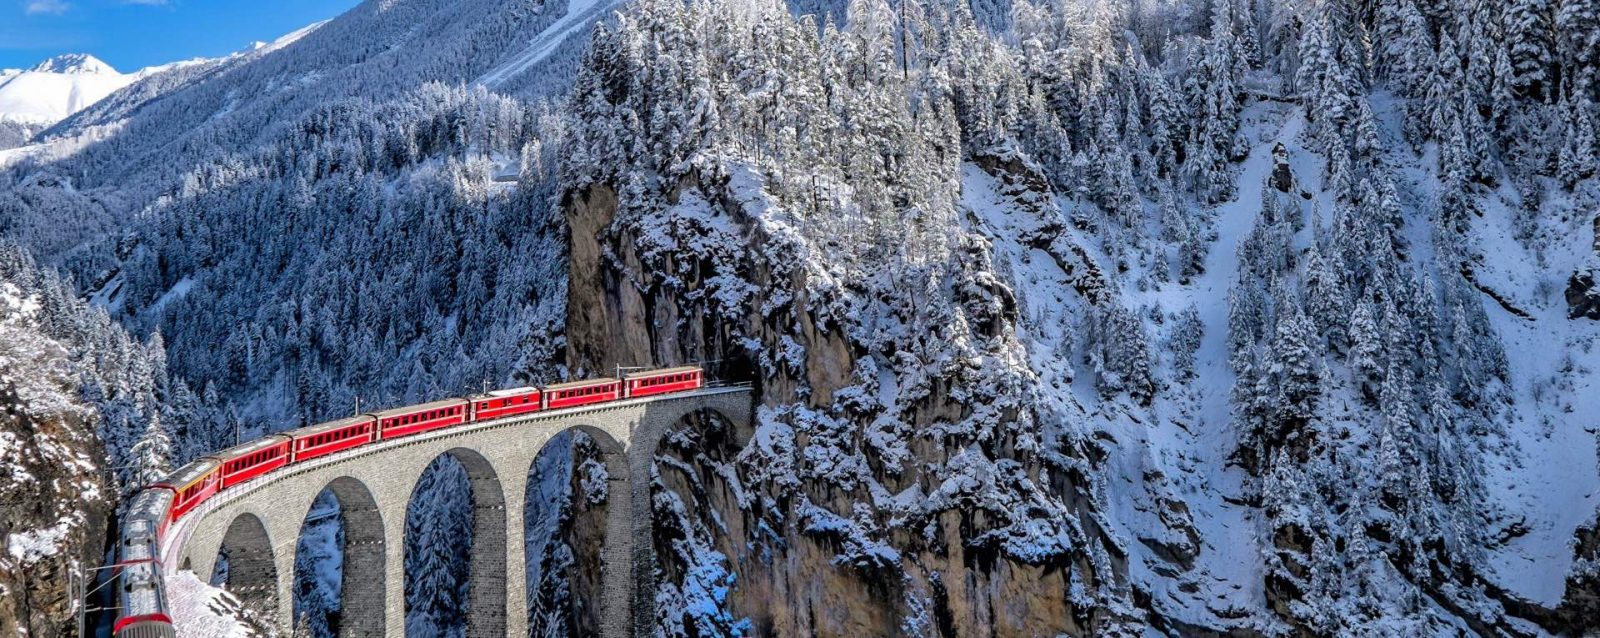 trens panorâmicos suica